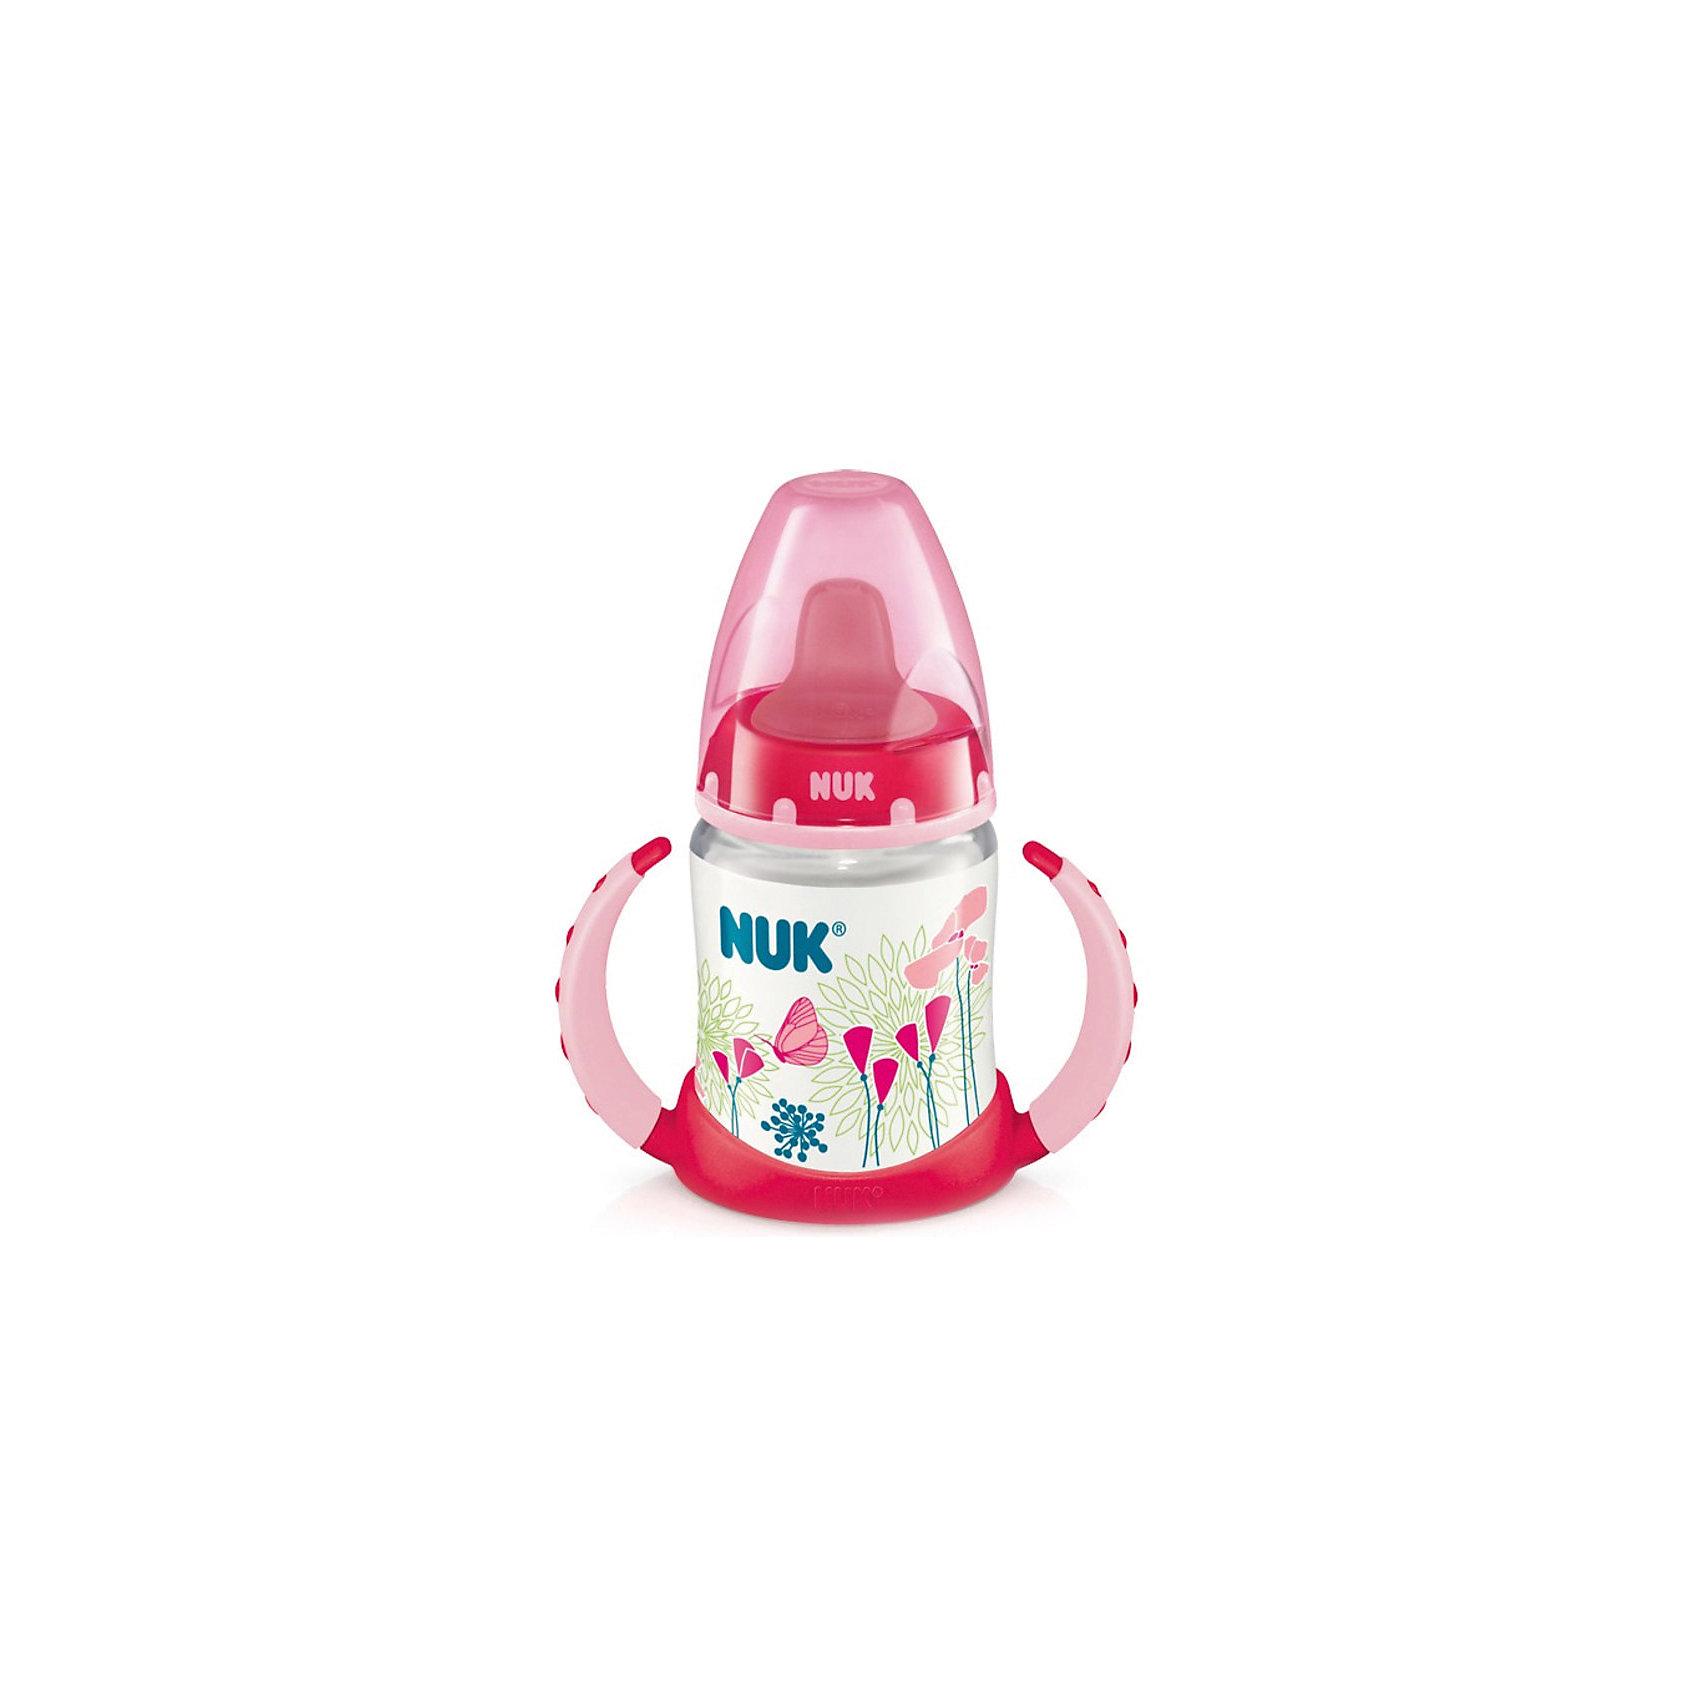 NUK Бутылочка First Choice-поильник пласт. 150 мл., NUK, розовый